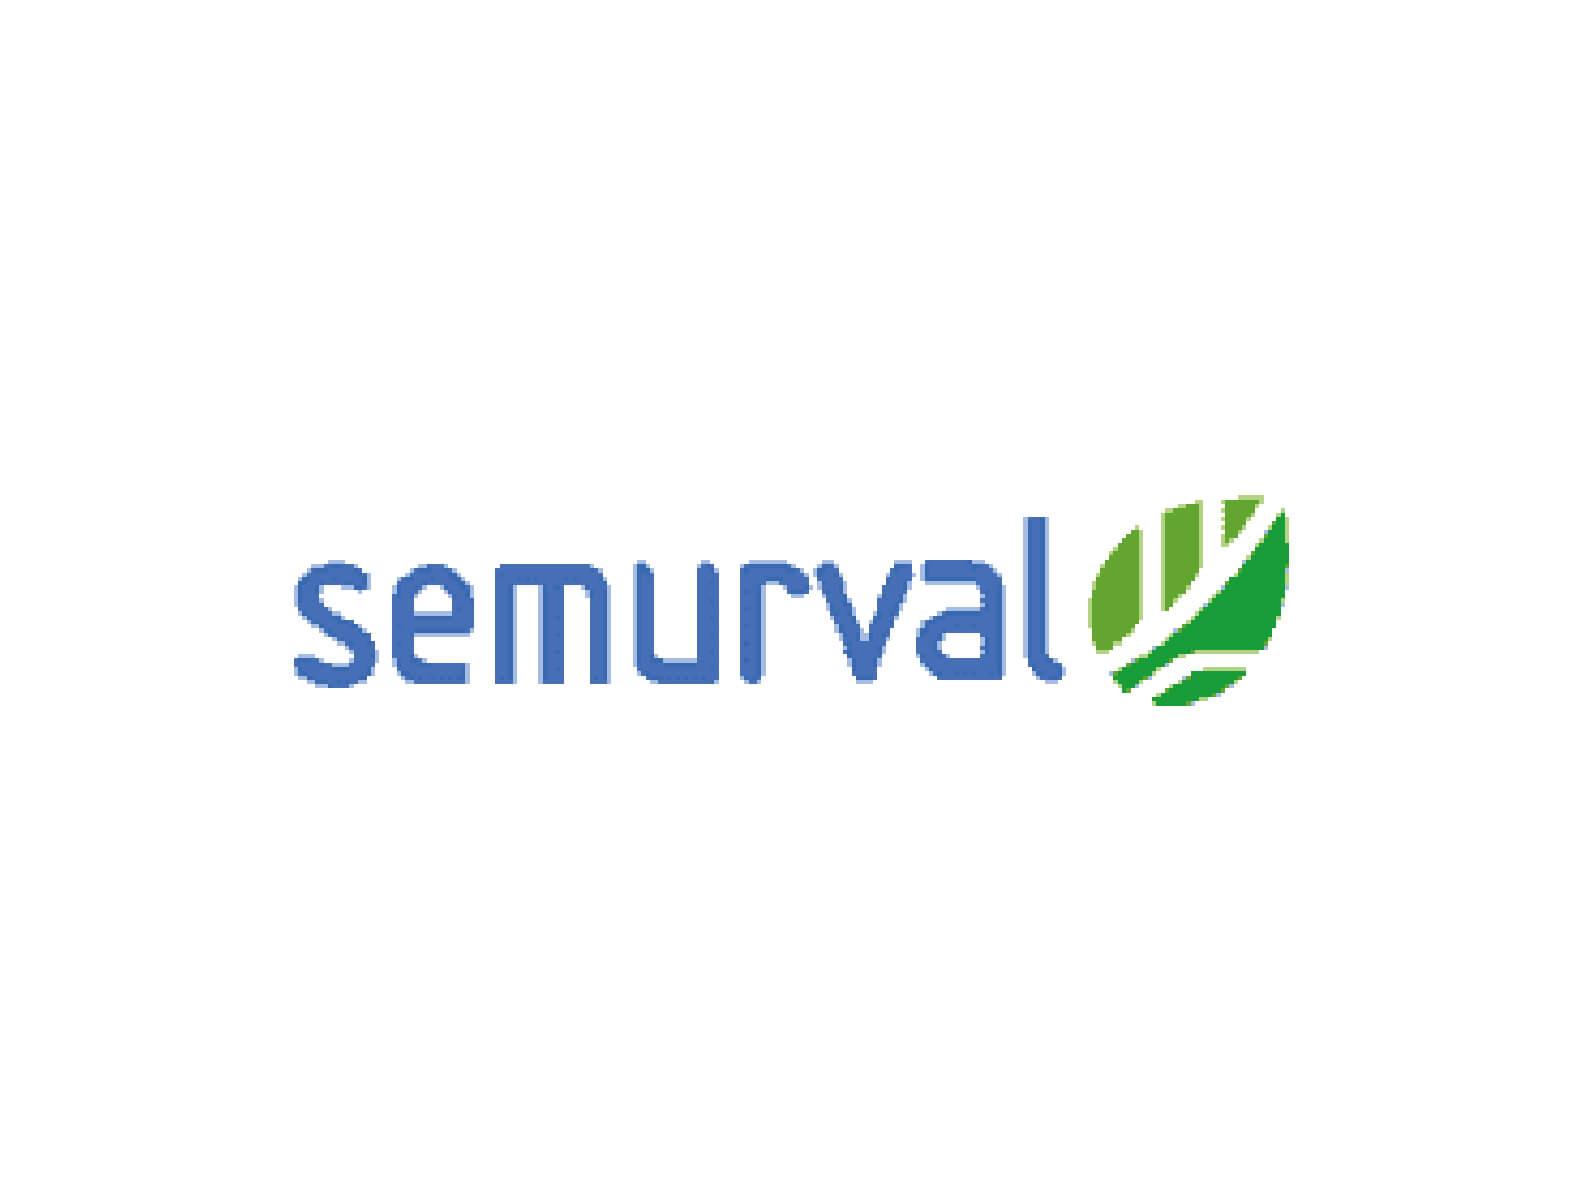 agence kayak communication web lille nord semurval logo eco